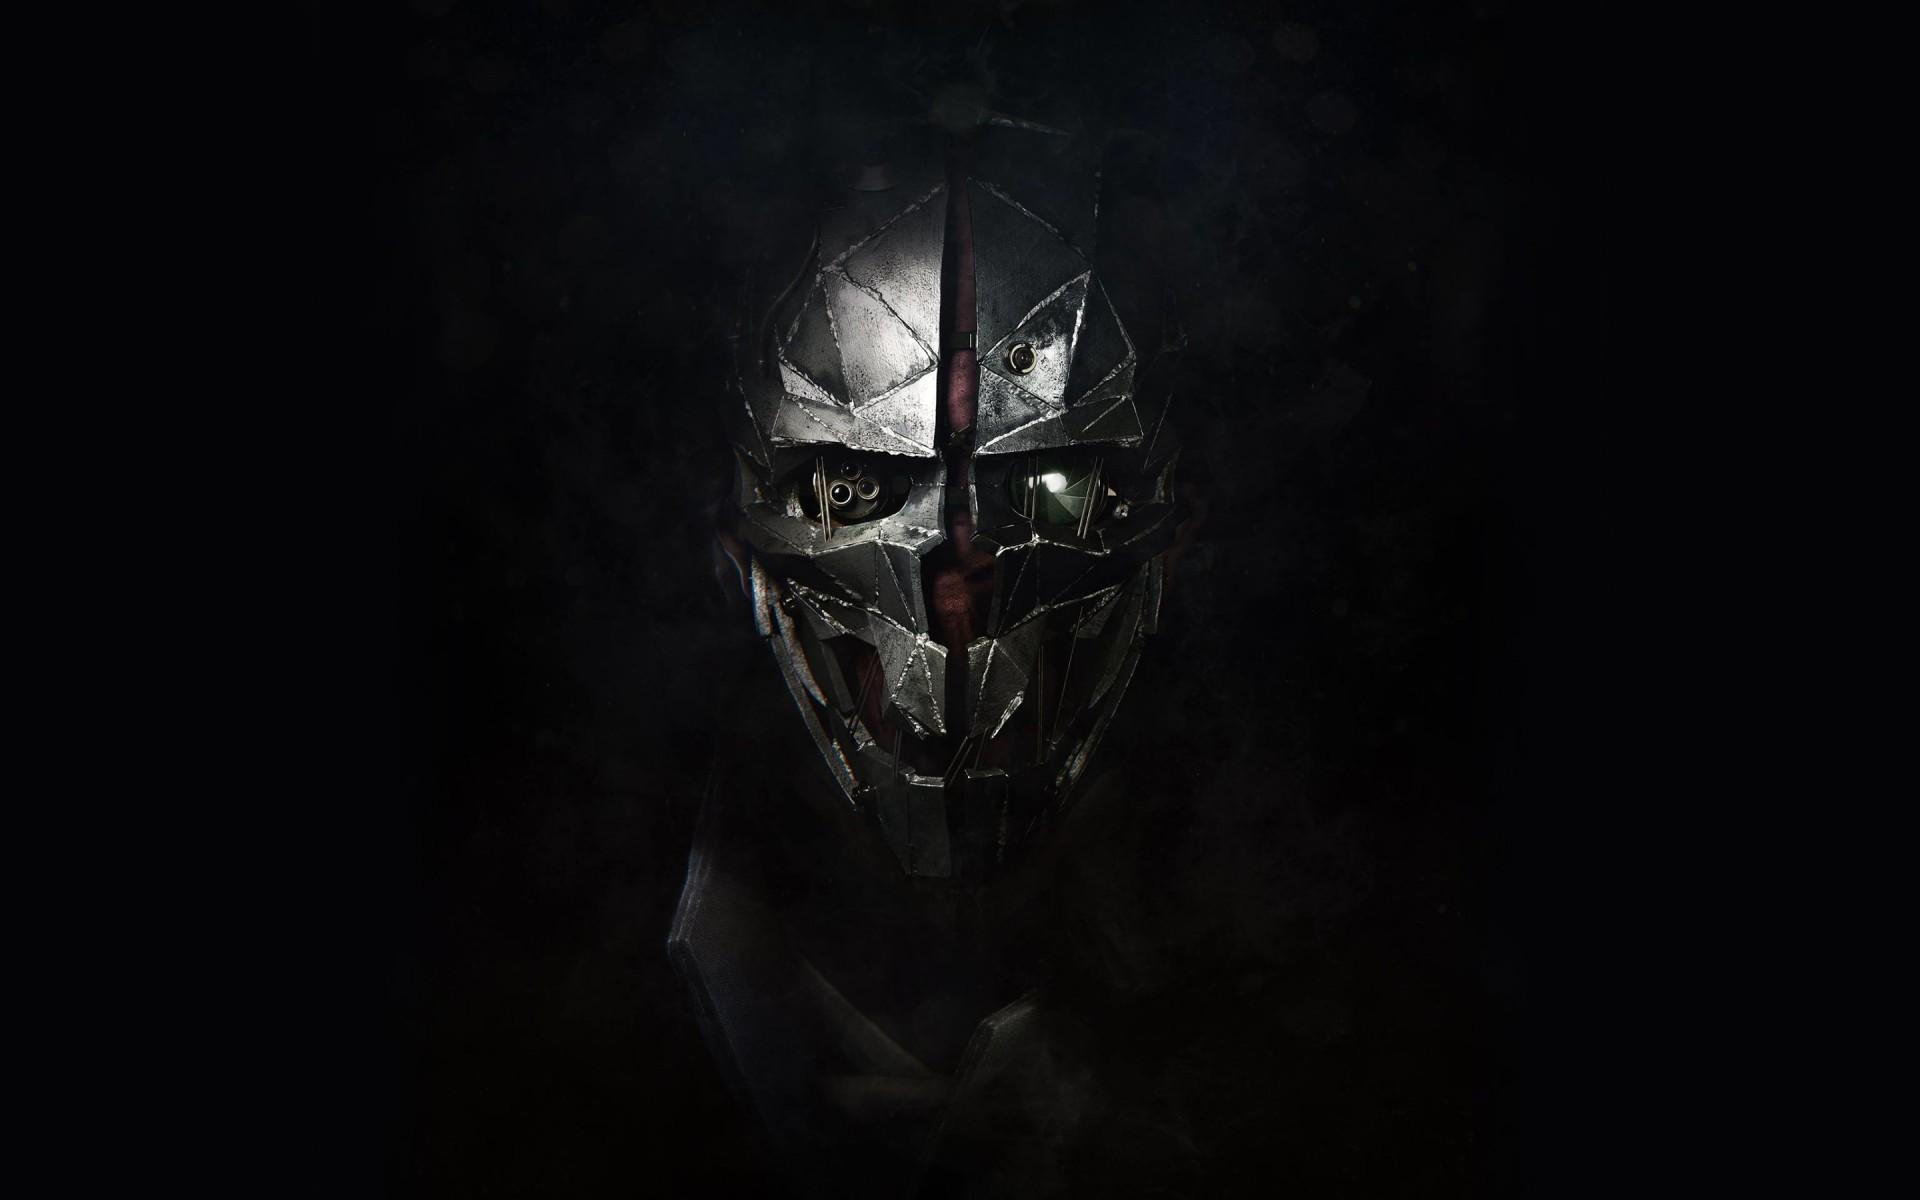 Tekken 5 Hd Wallpaper Download Dishonored 2 Corvo Wallpapers Hd Wallpapers Id 18203